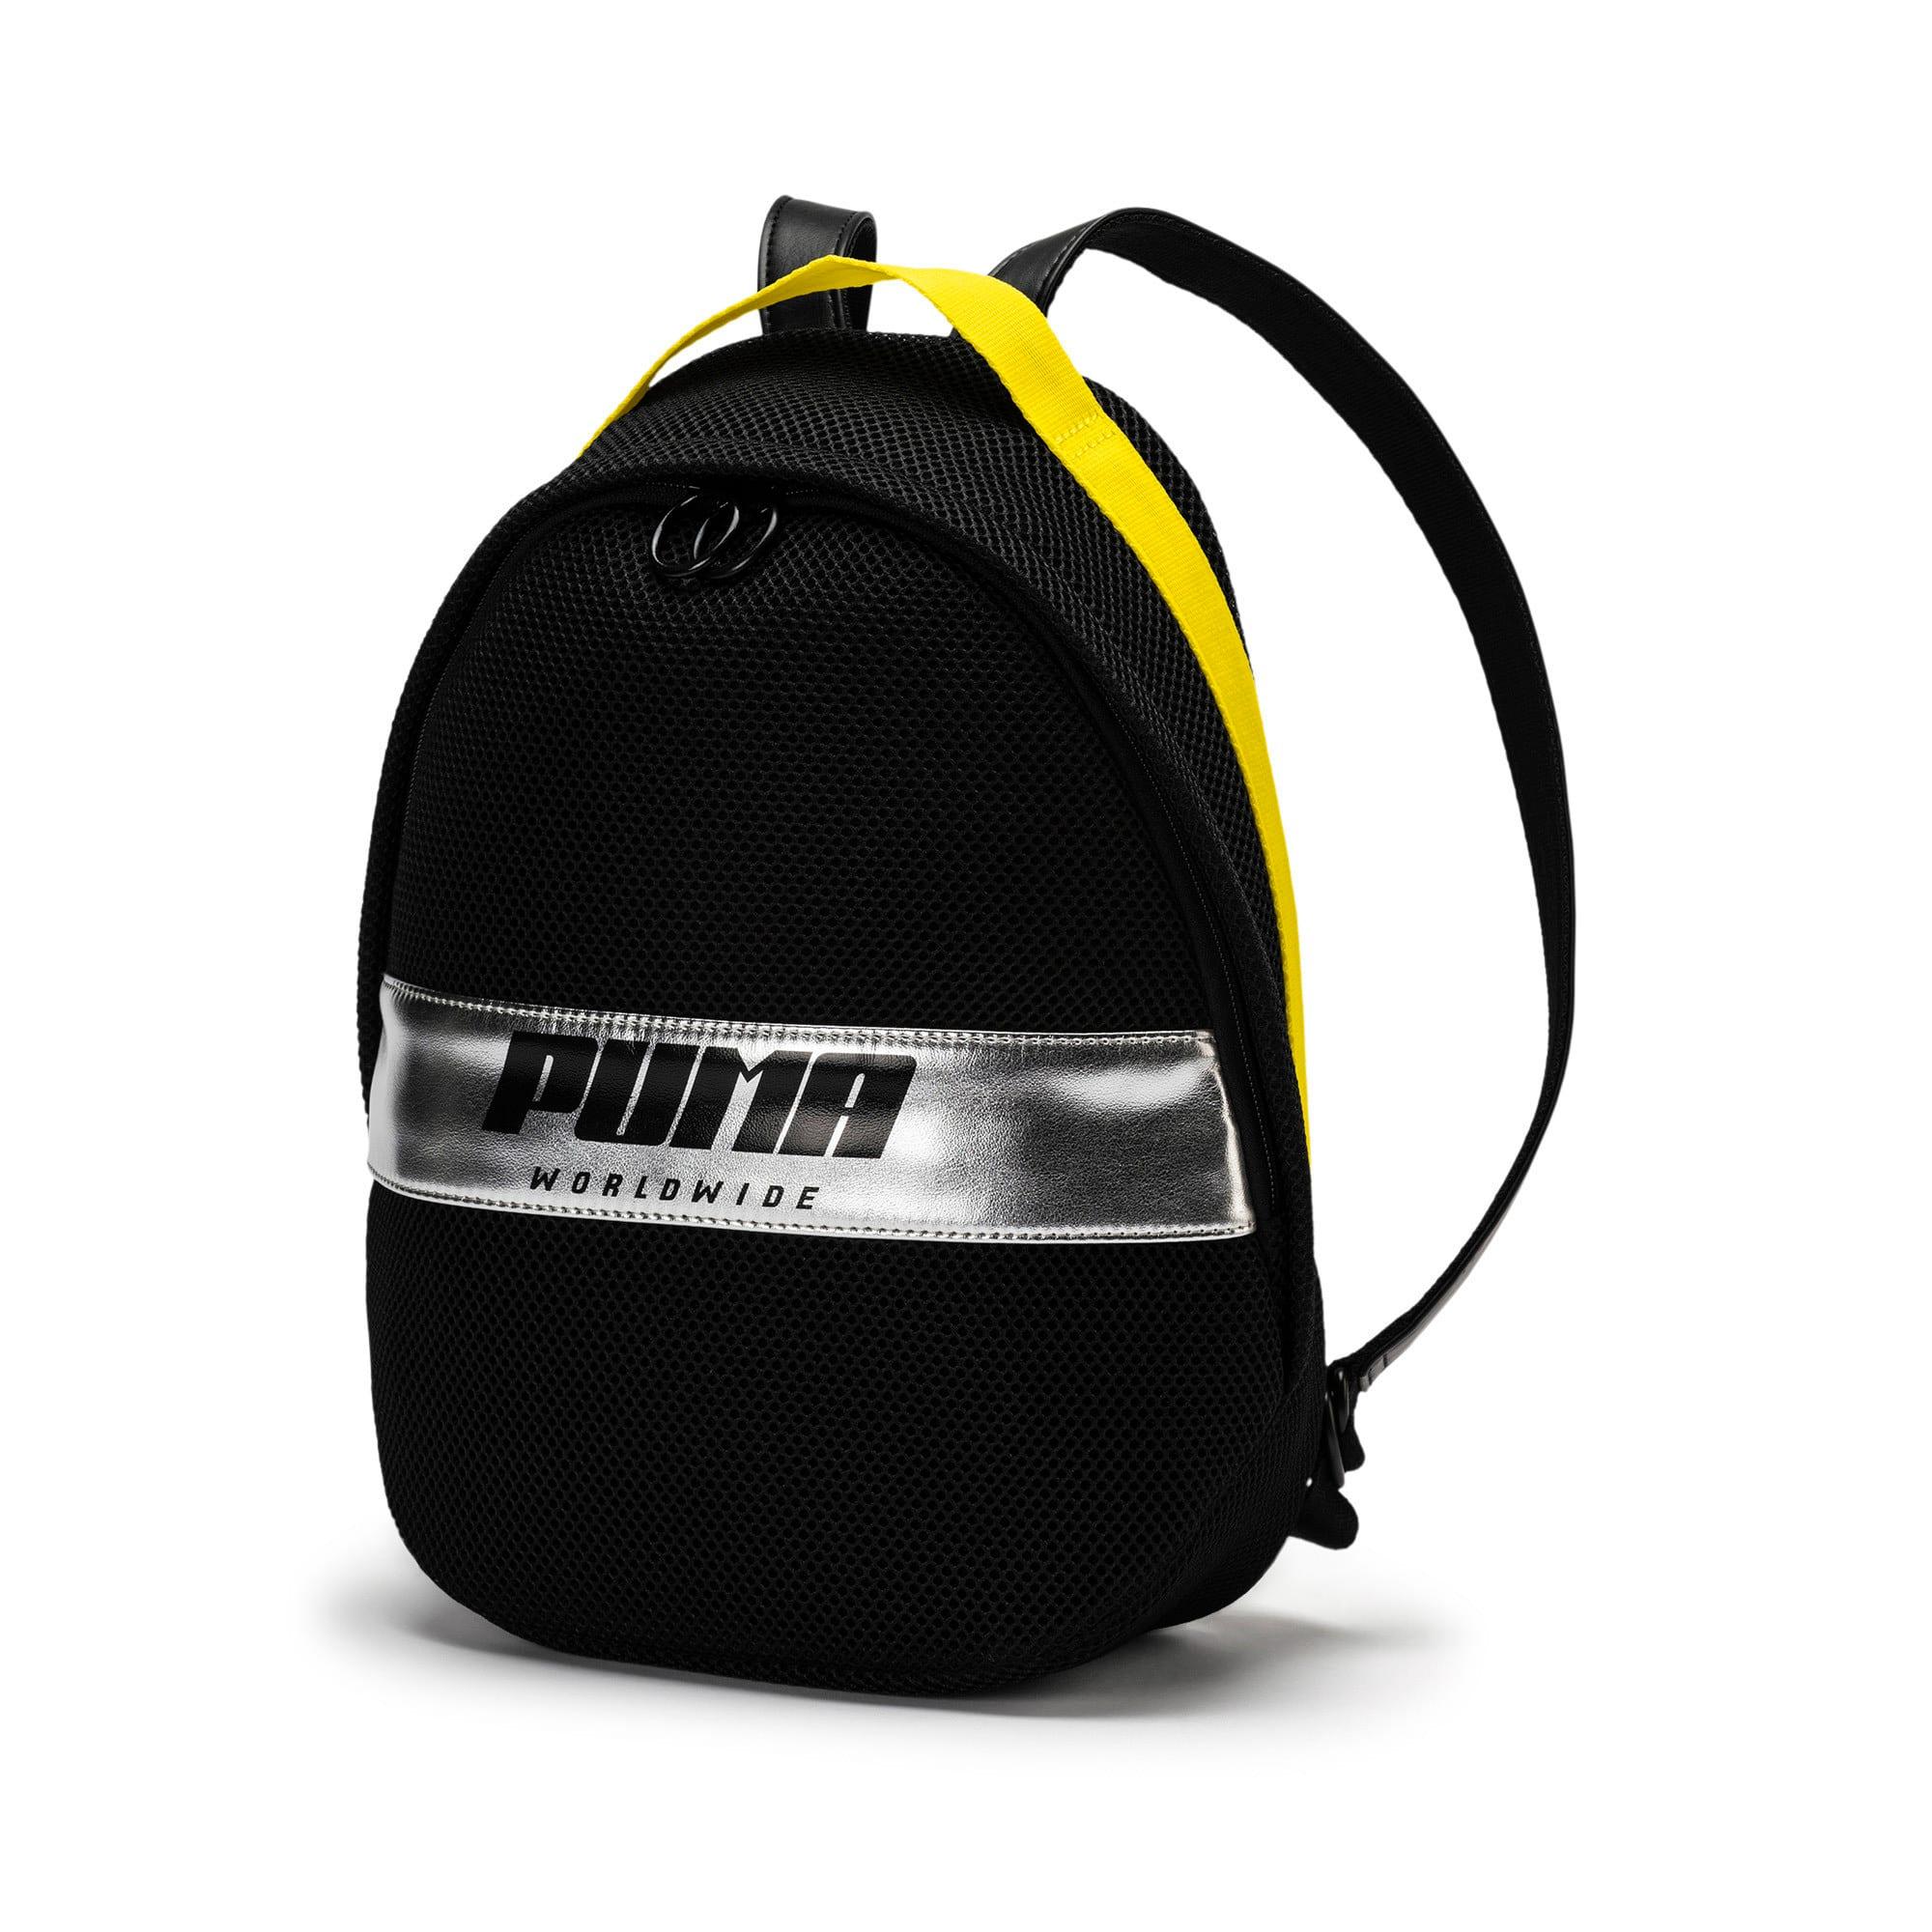 Thumbnail 1 of Women's Street Backpack, Puma Black-Blazing Yellow, medium